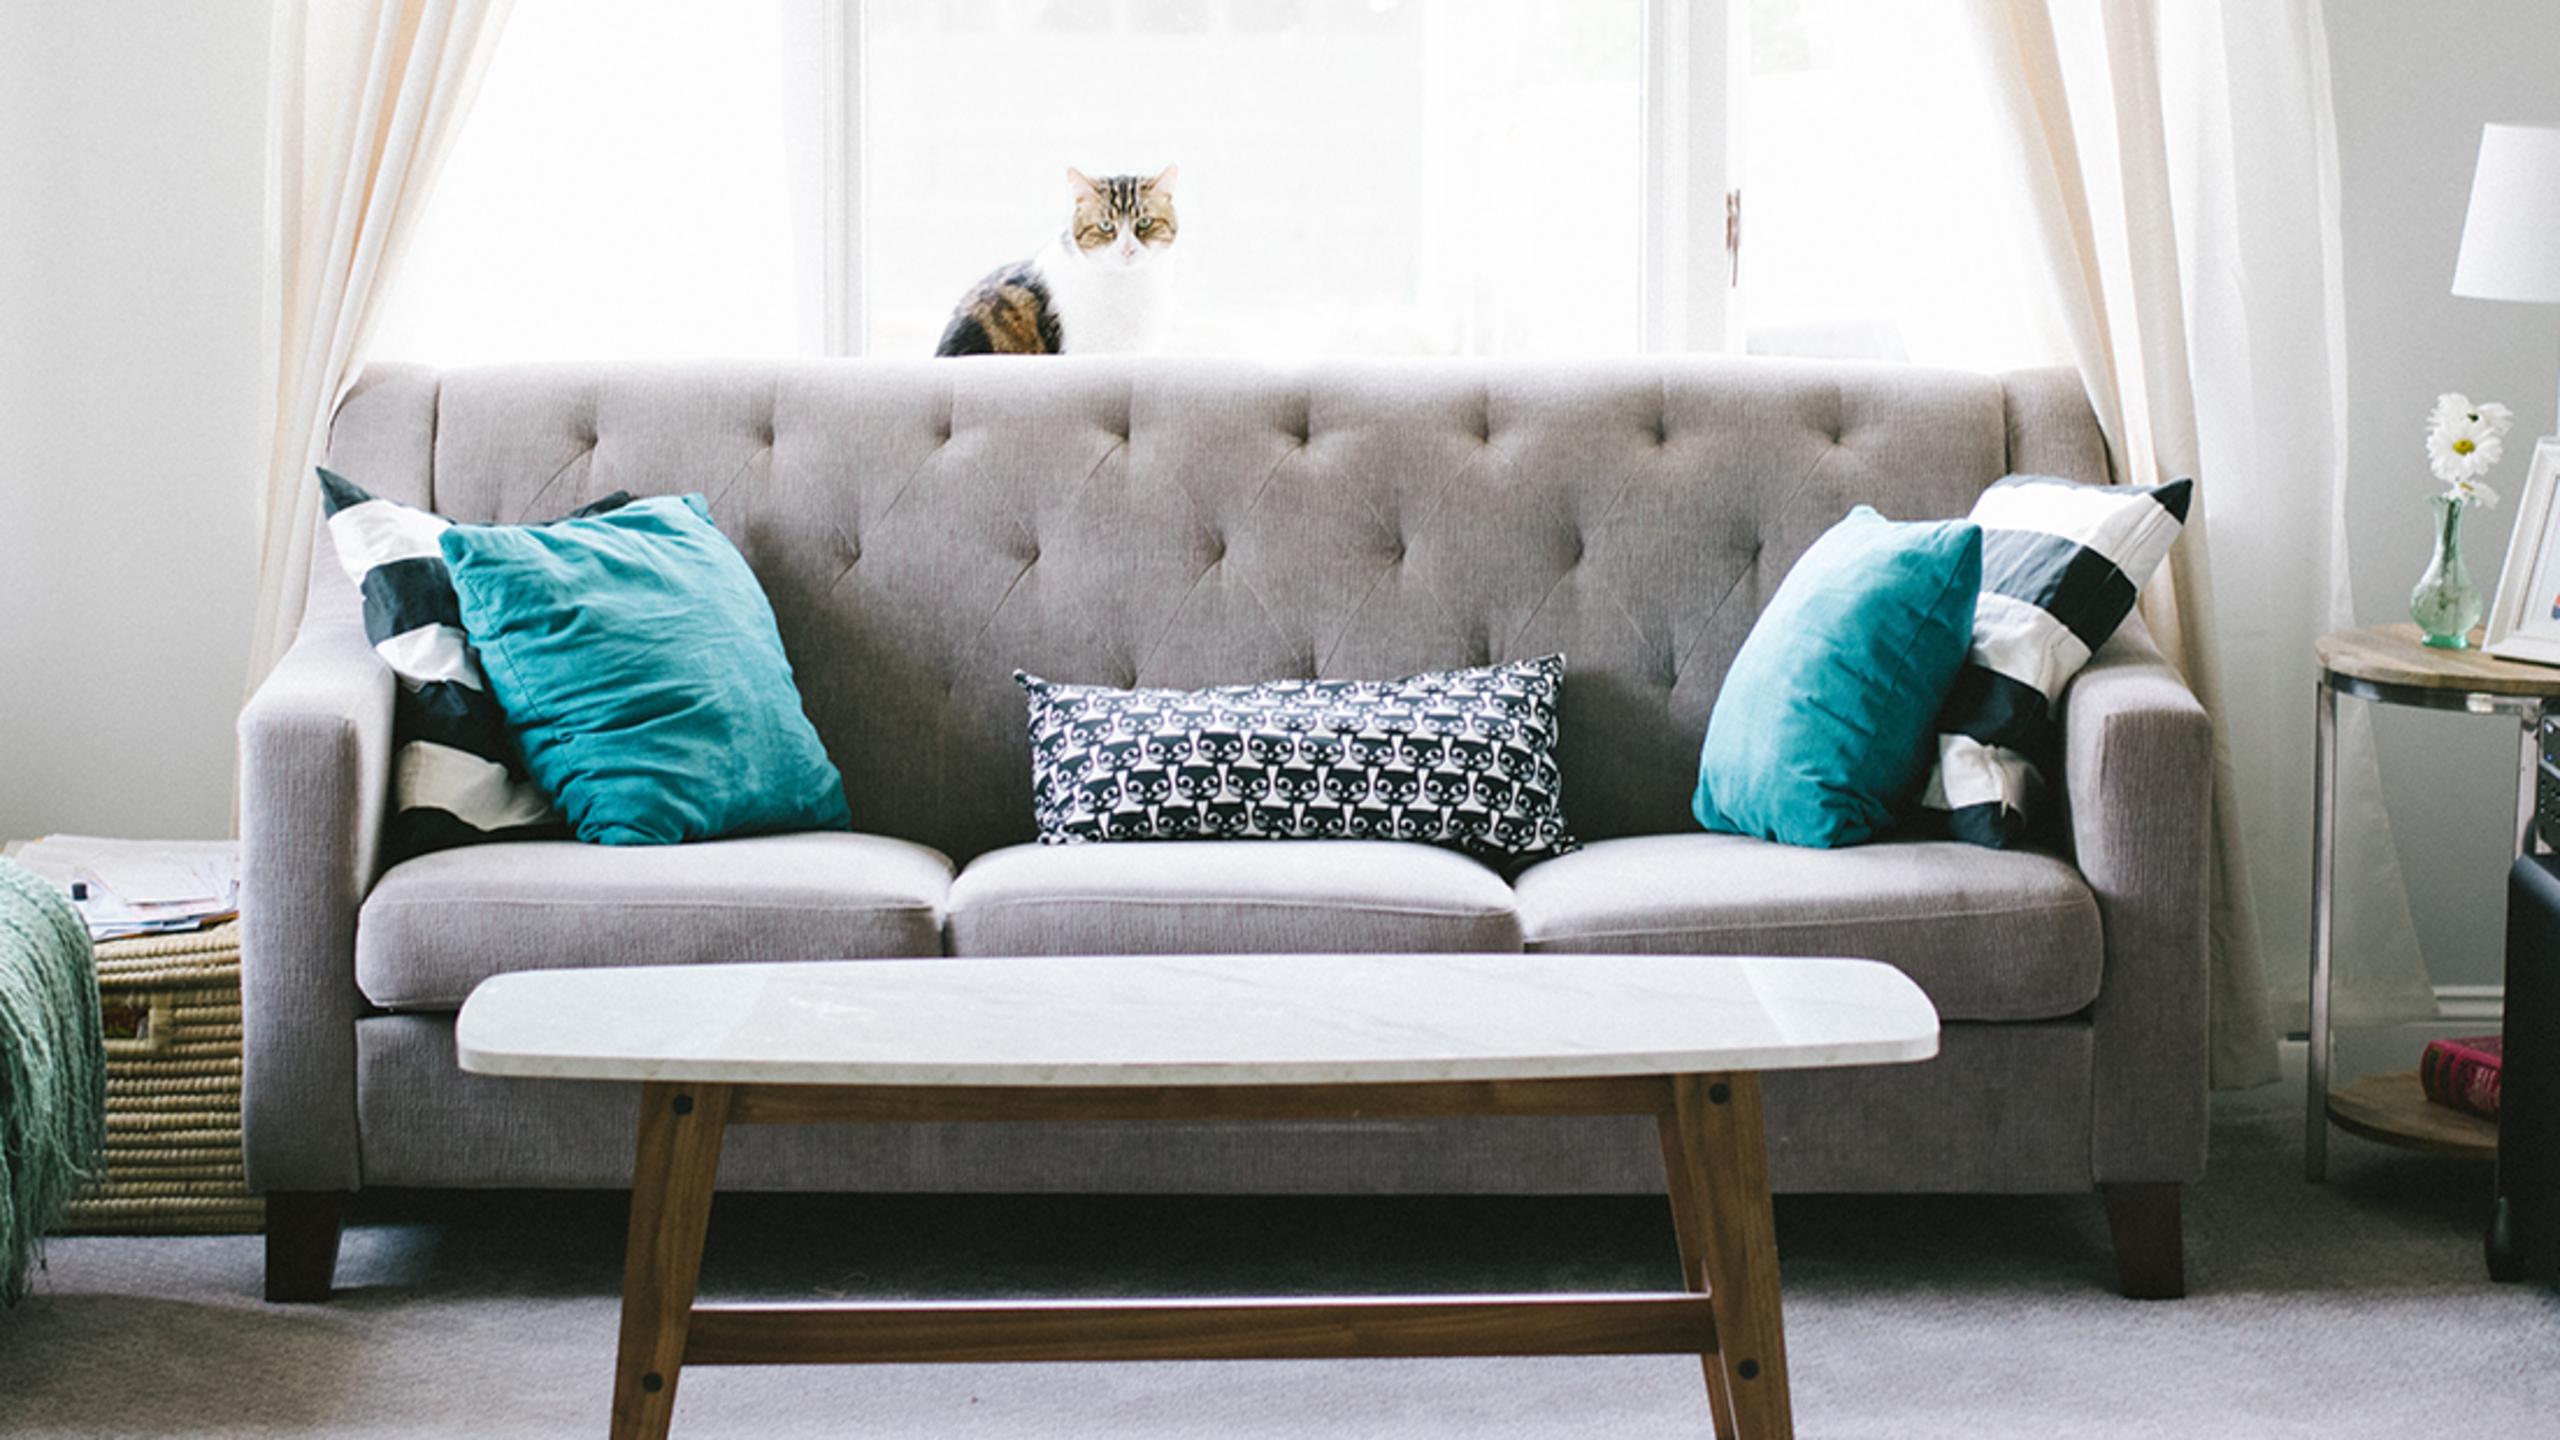 Interior Designer Secrets on How to Shop Craigslist for Home Decor ...